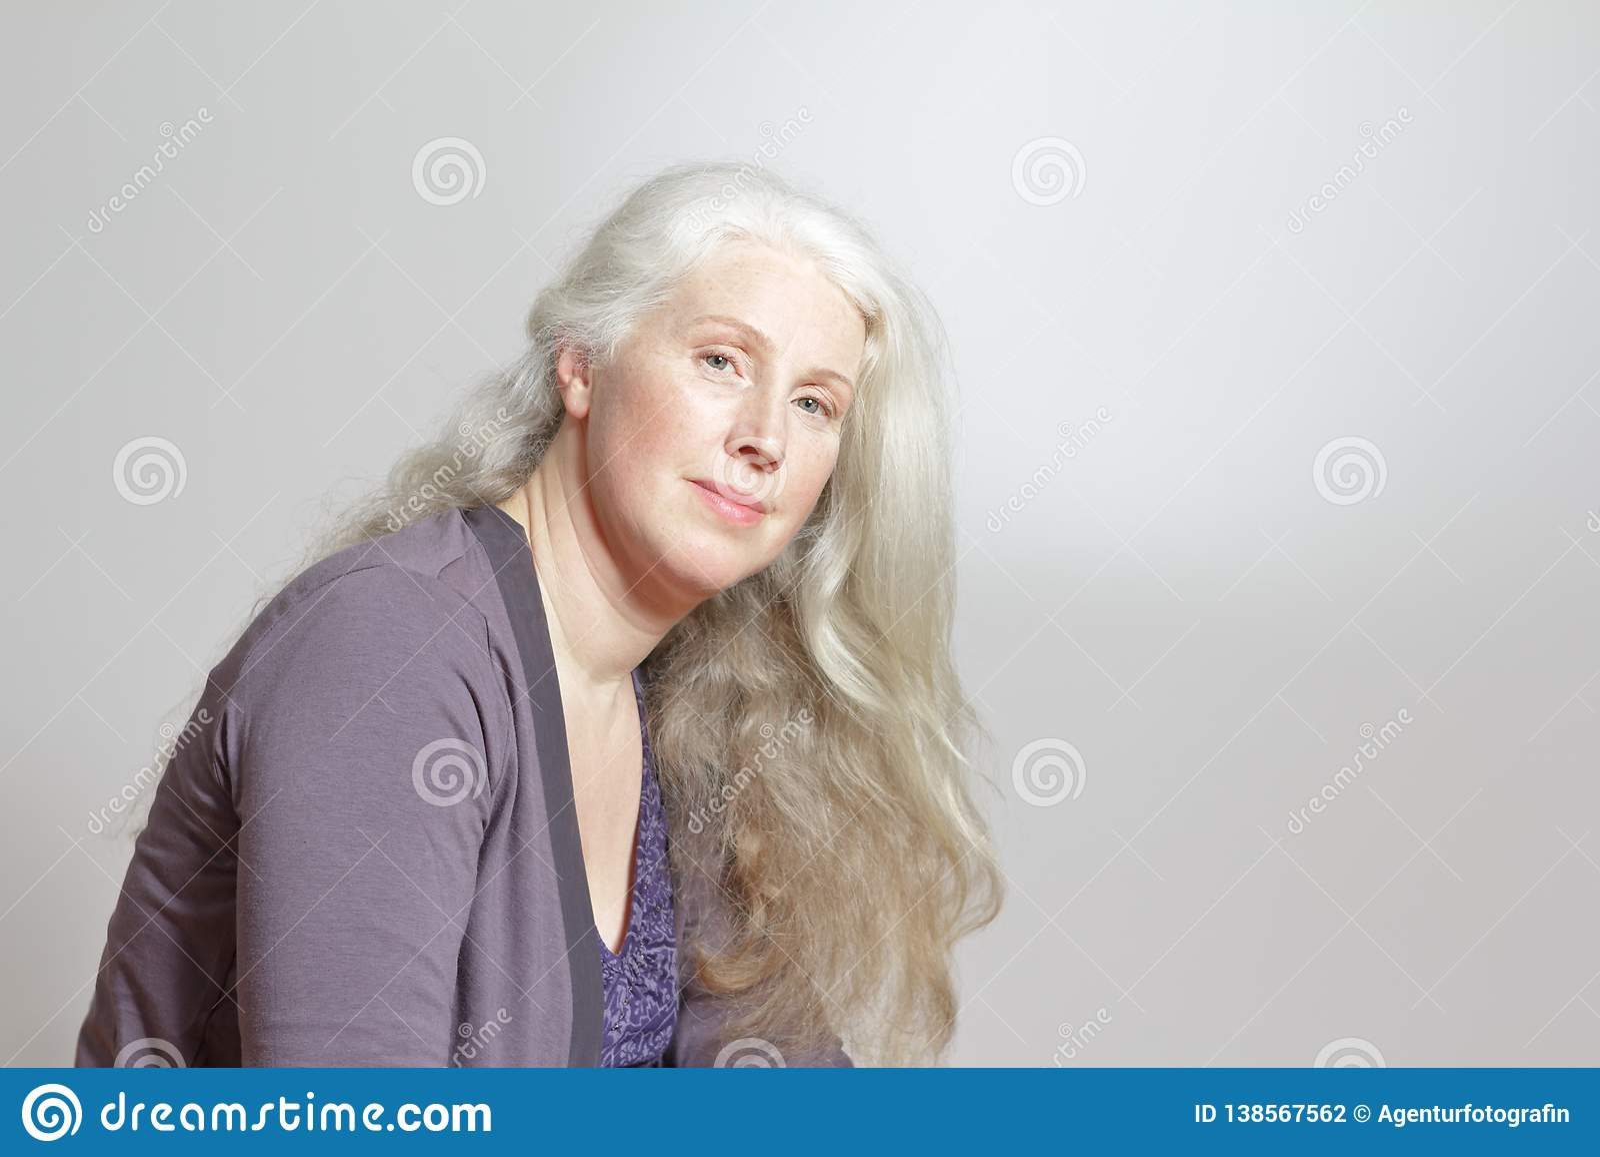 Portrait Mature Woman Long White Hair Stock Photo - Image of ...